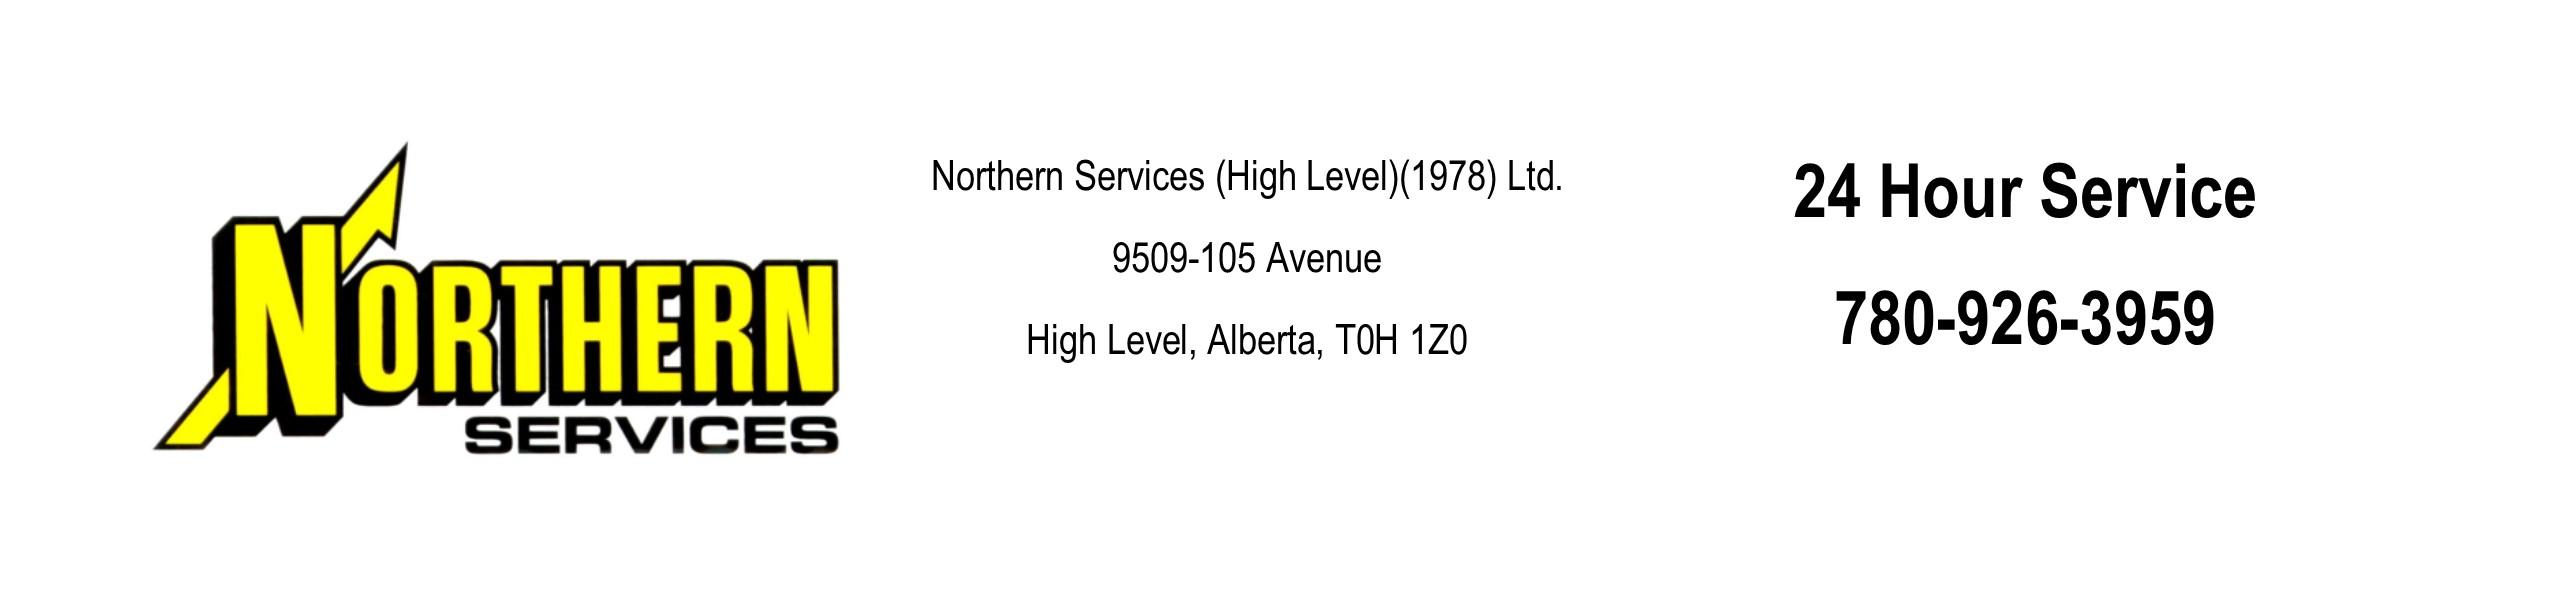 Northern Services (High Level)(1978) Ltd.